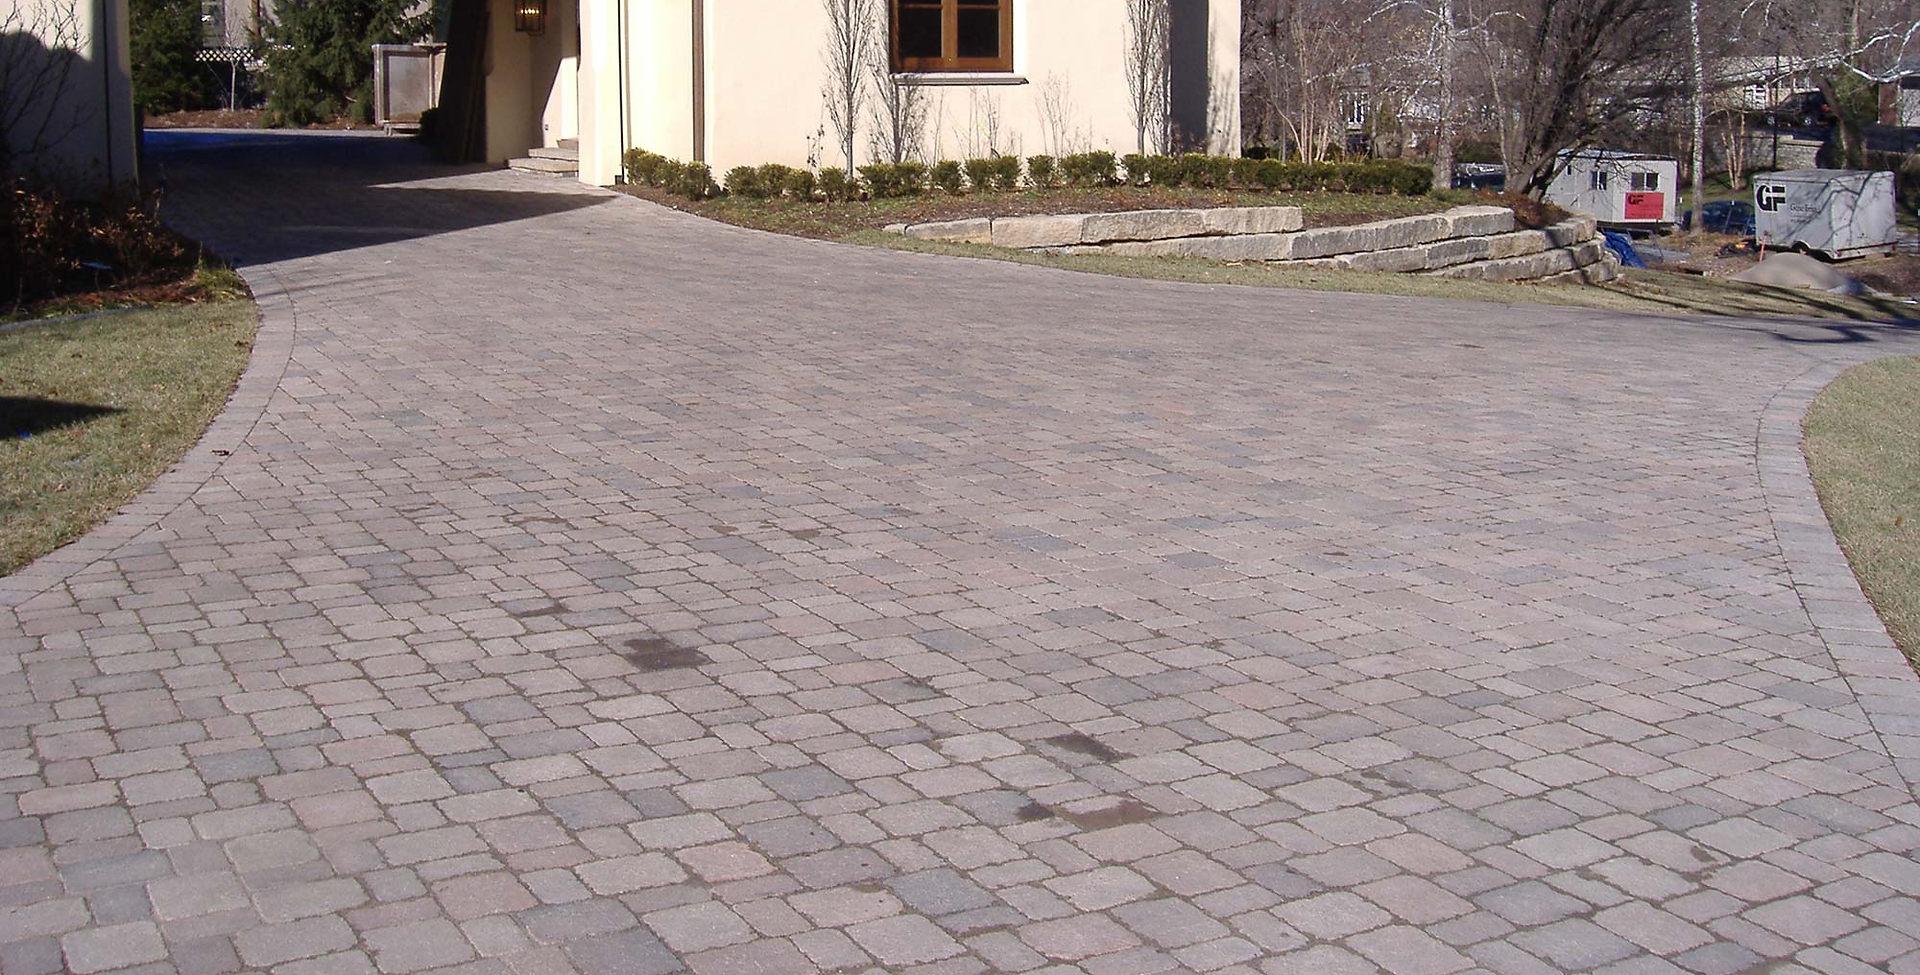 Mission Hills Unilock paver driveway.